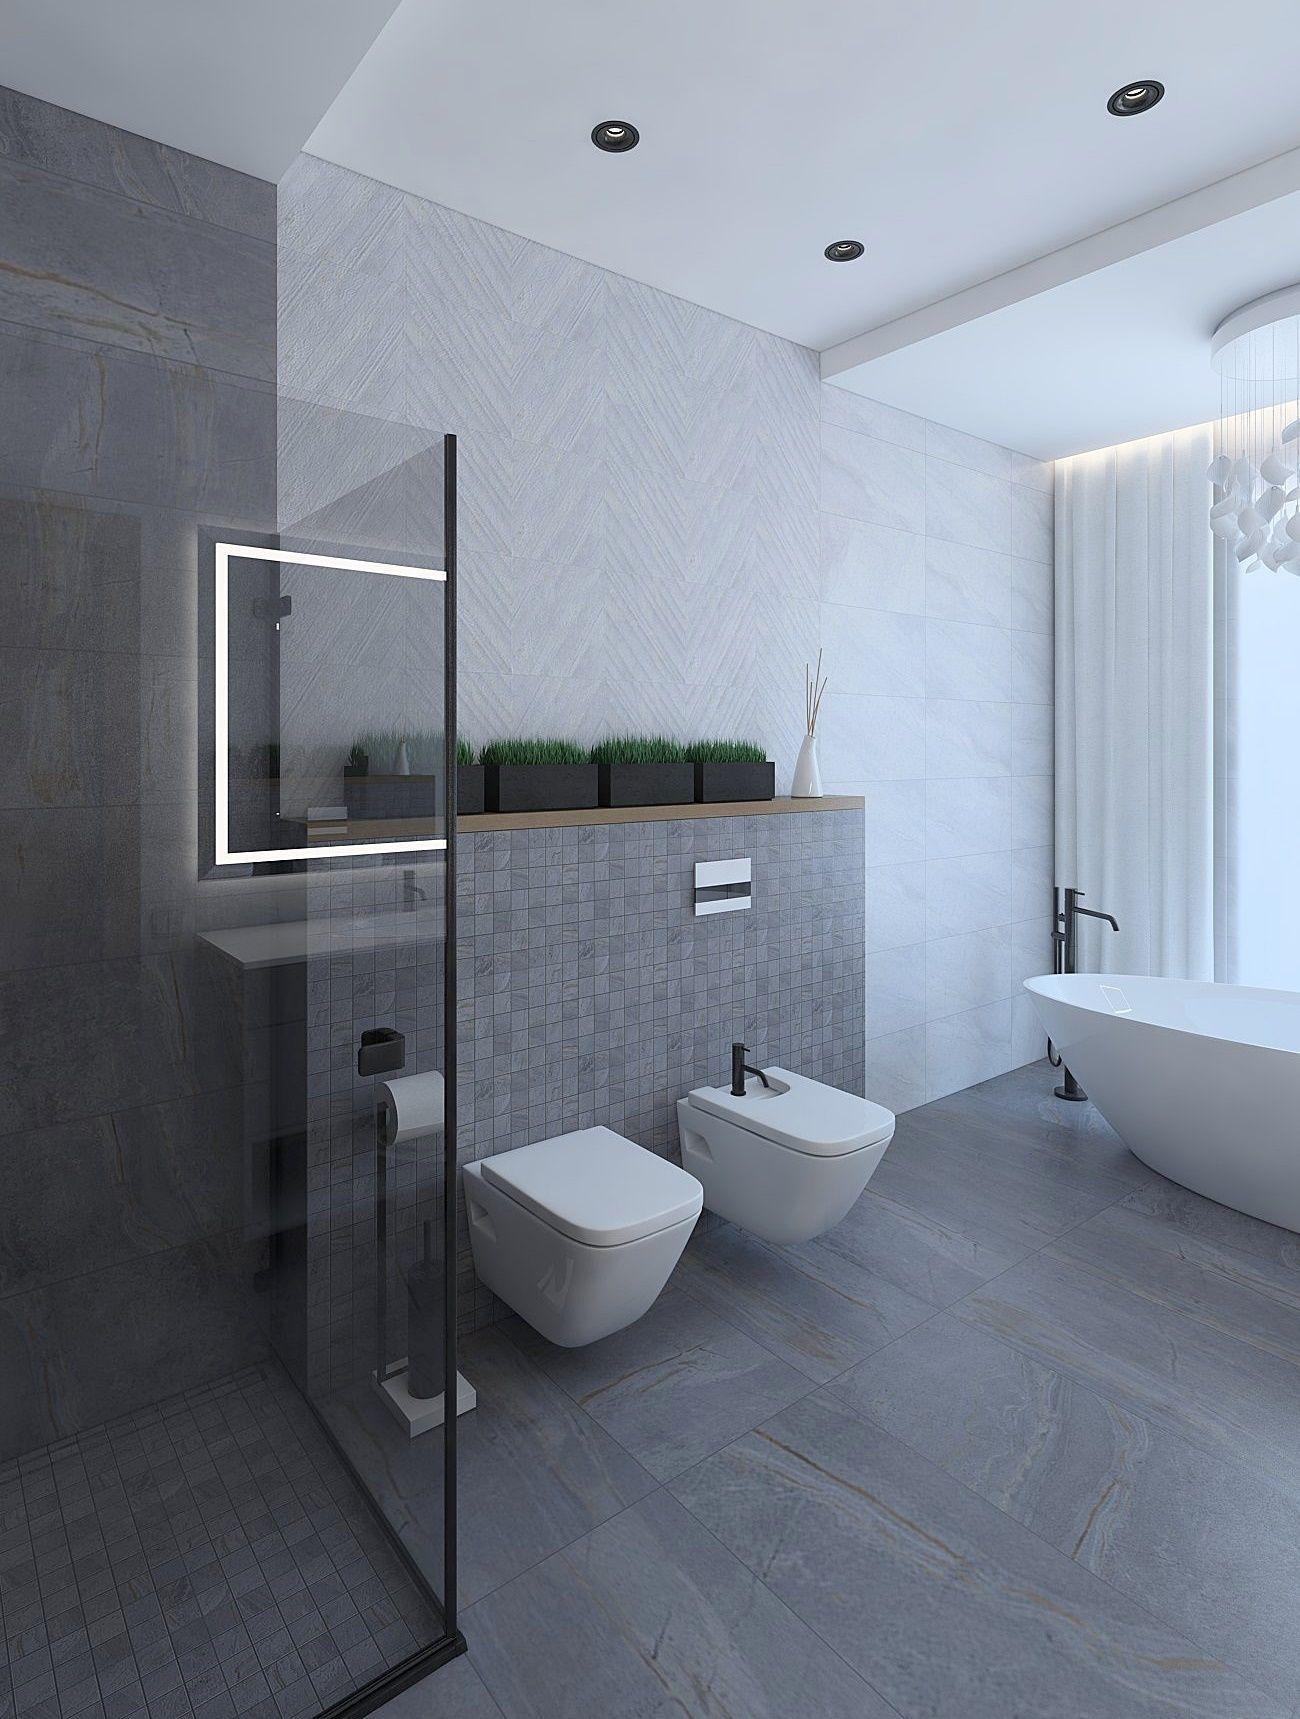 Bathroom Stone Tiles Image Of